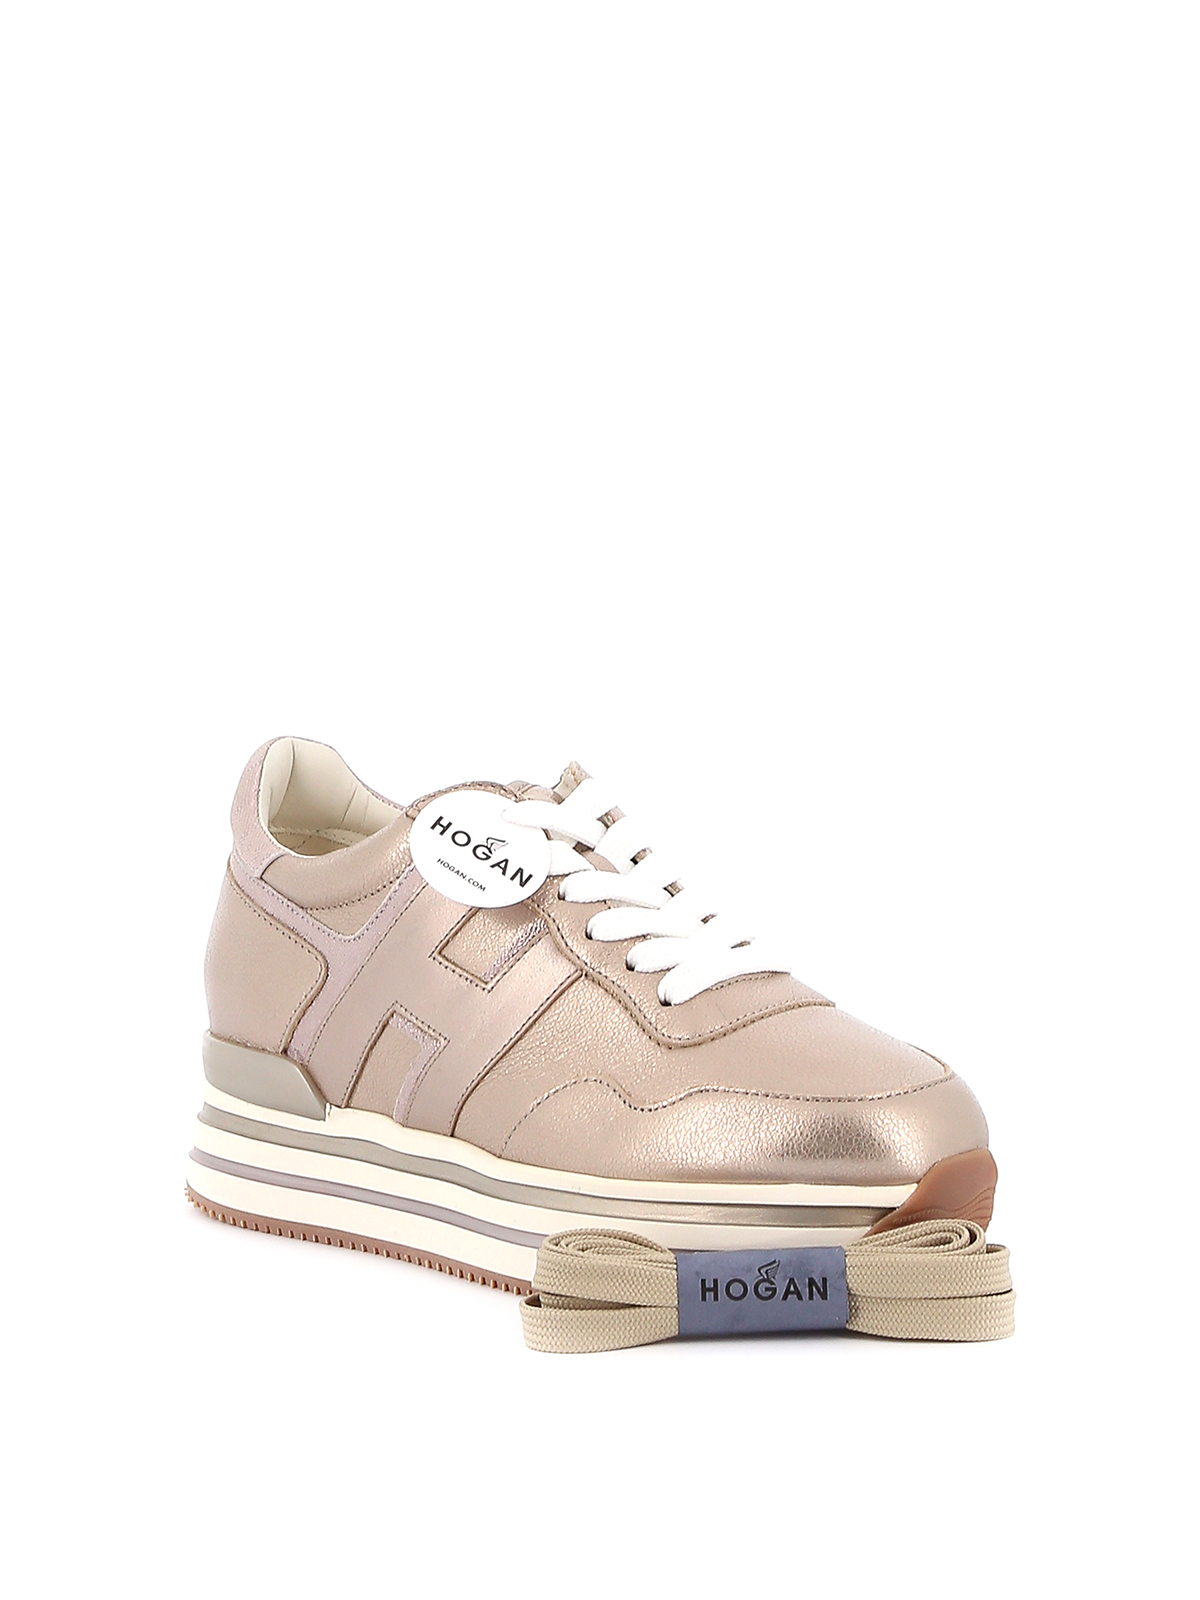 Trainers Hogan - Midi H222 laminated sneakers - HXW4830CB81N1VC210